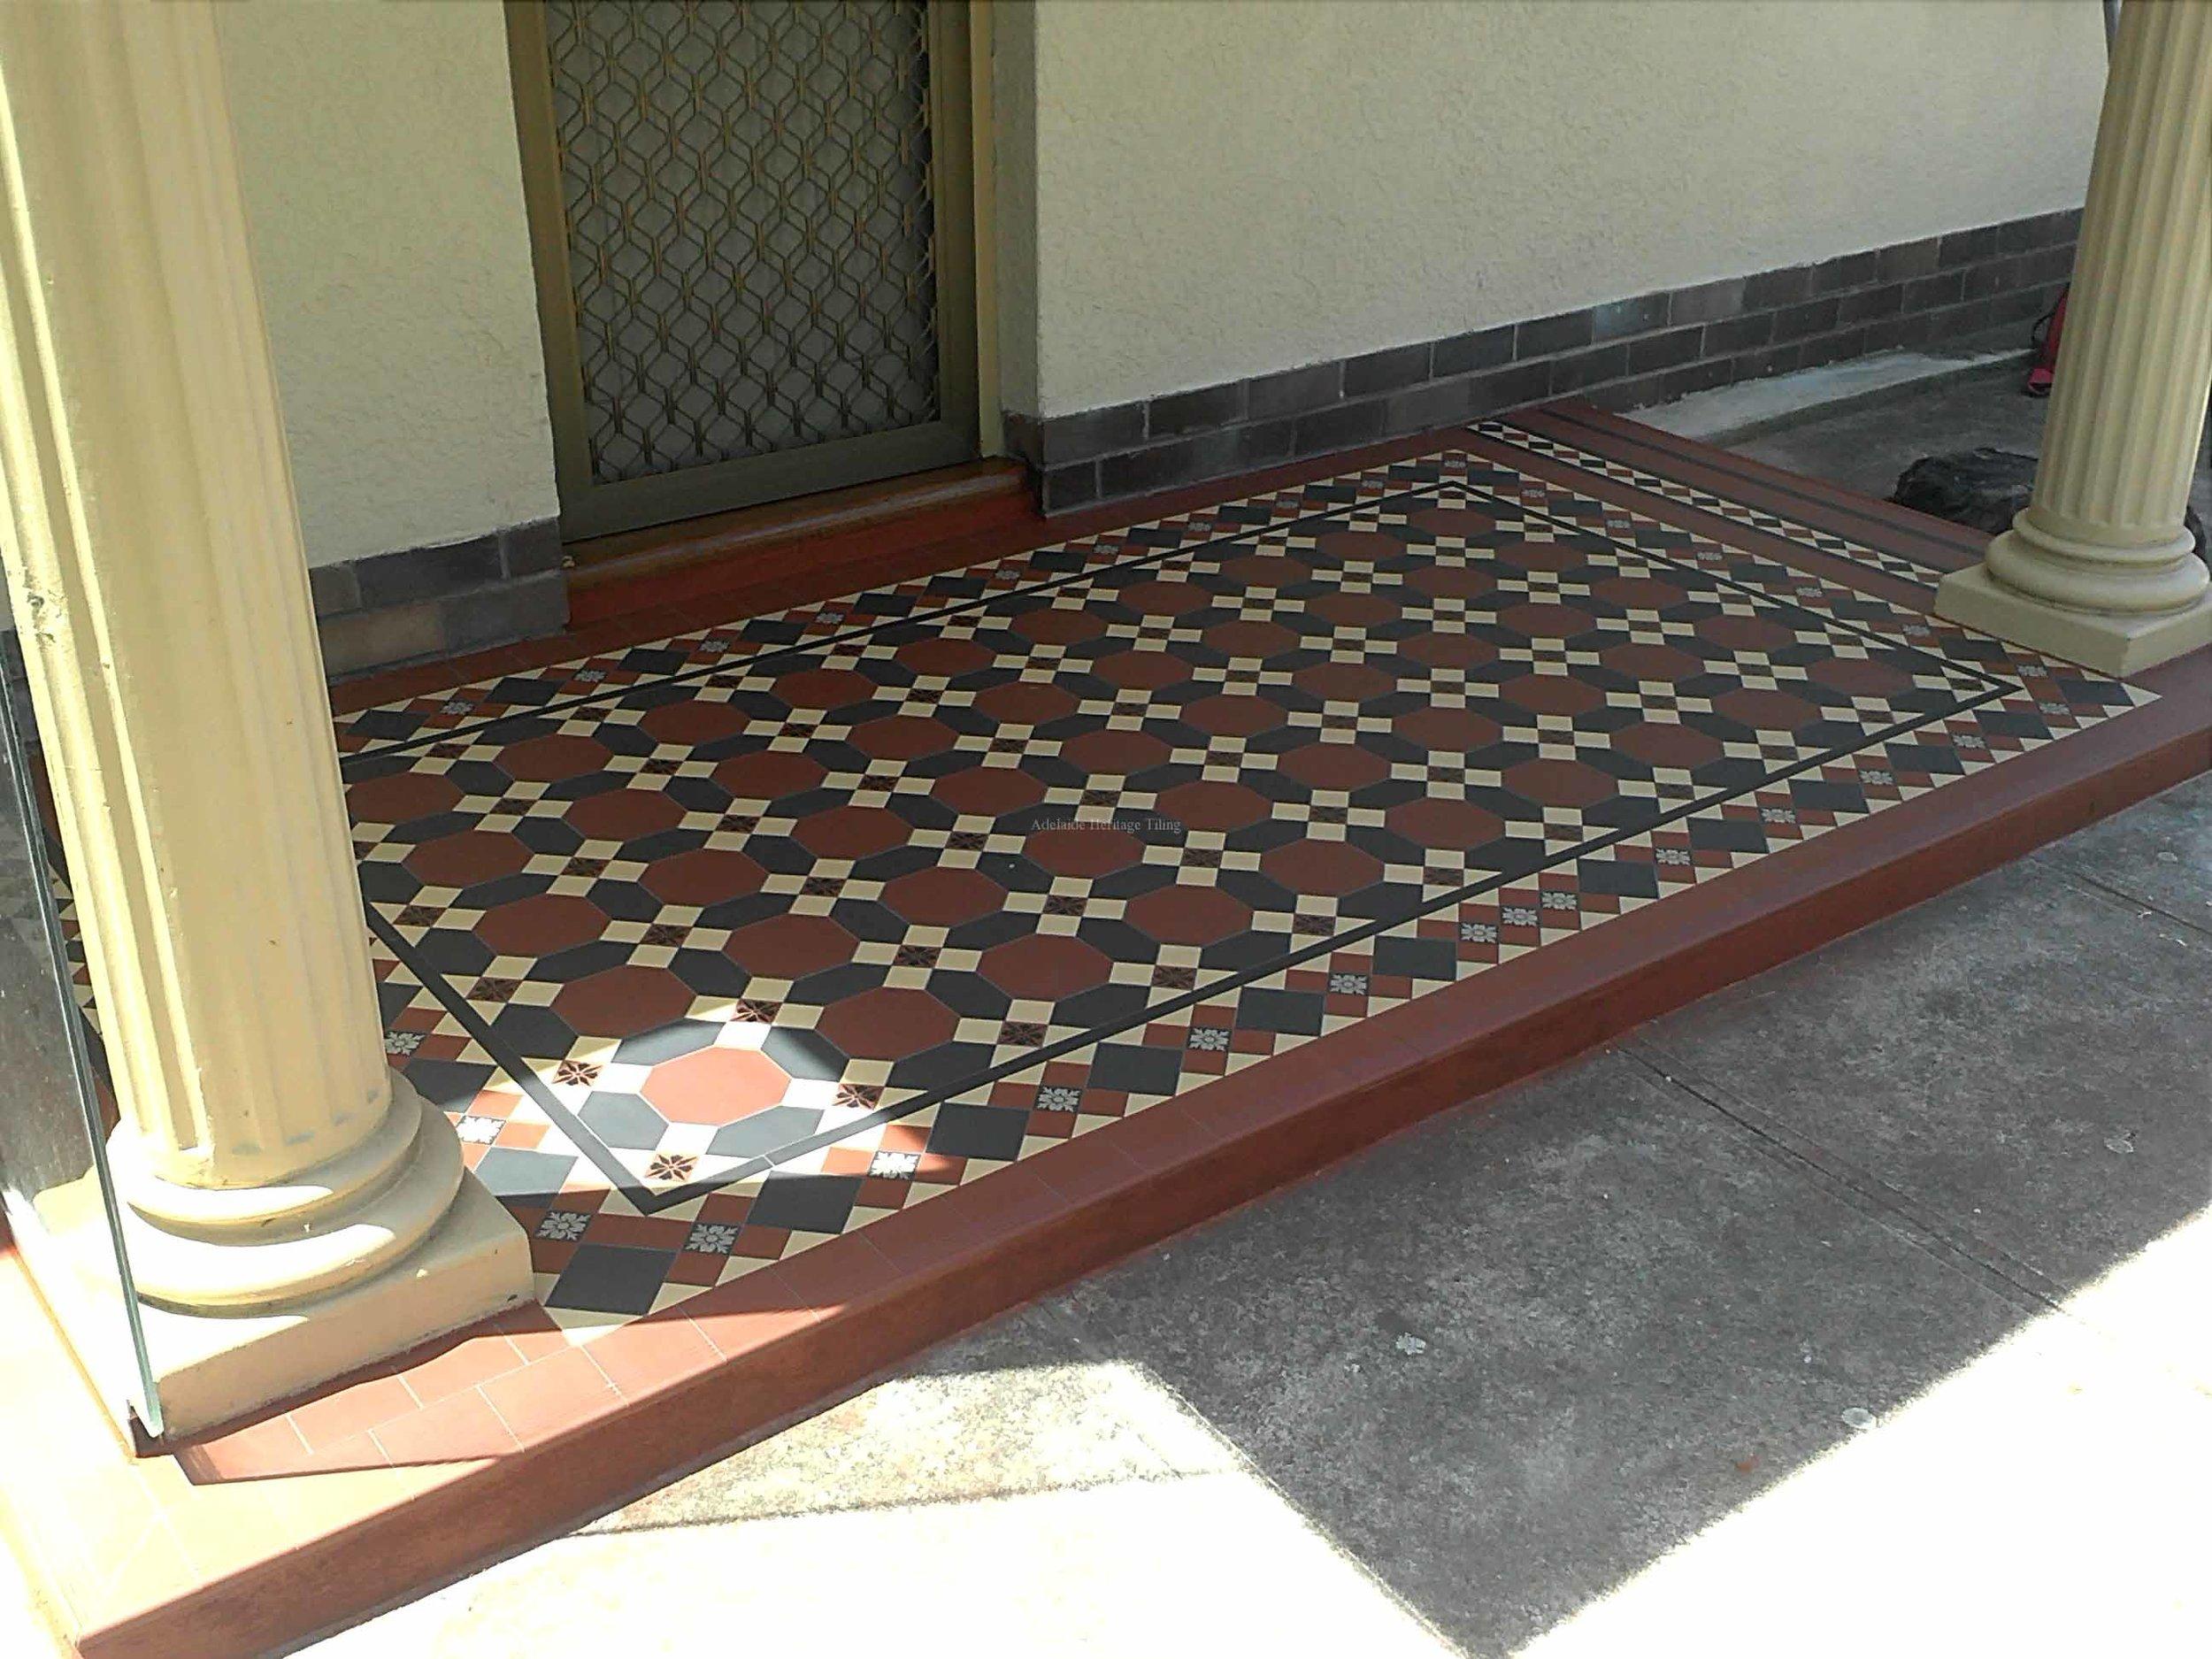 Custom tessellated pattern and border